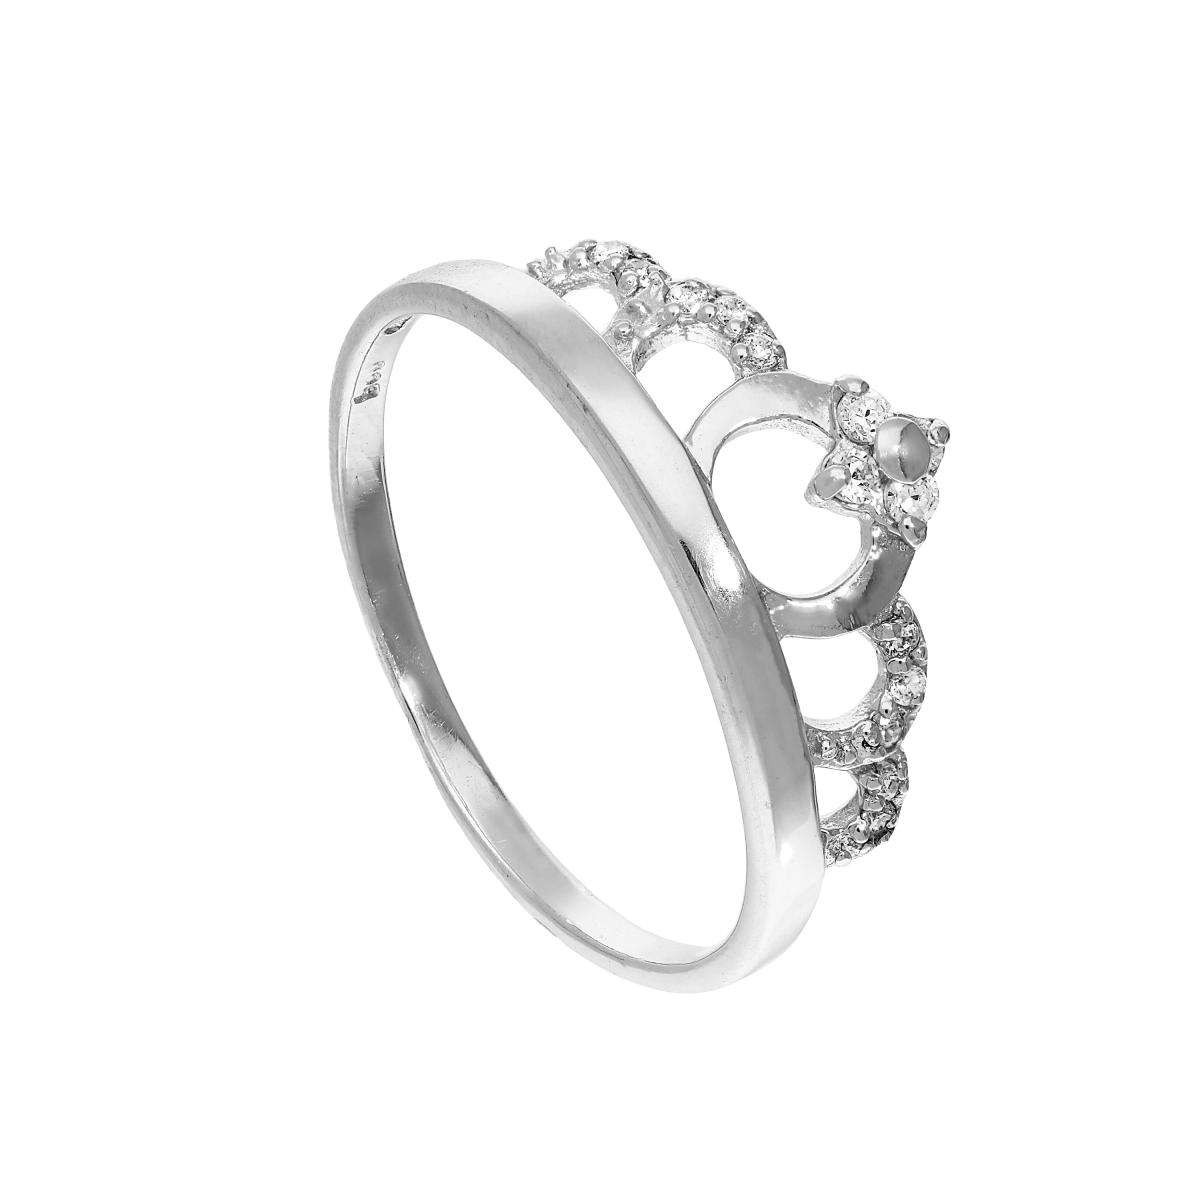 Sterling Silver & Clear Cz Crystal Tiara Ring Sizes J – U Pertaining To 2018 Tiara Wishbone Rings (View 13 of 25)